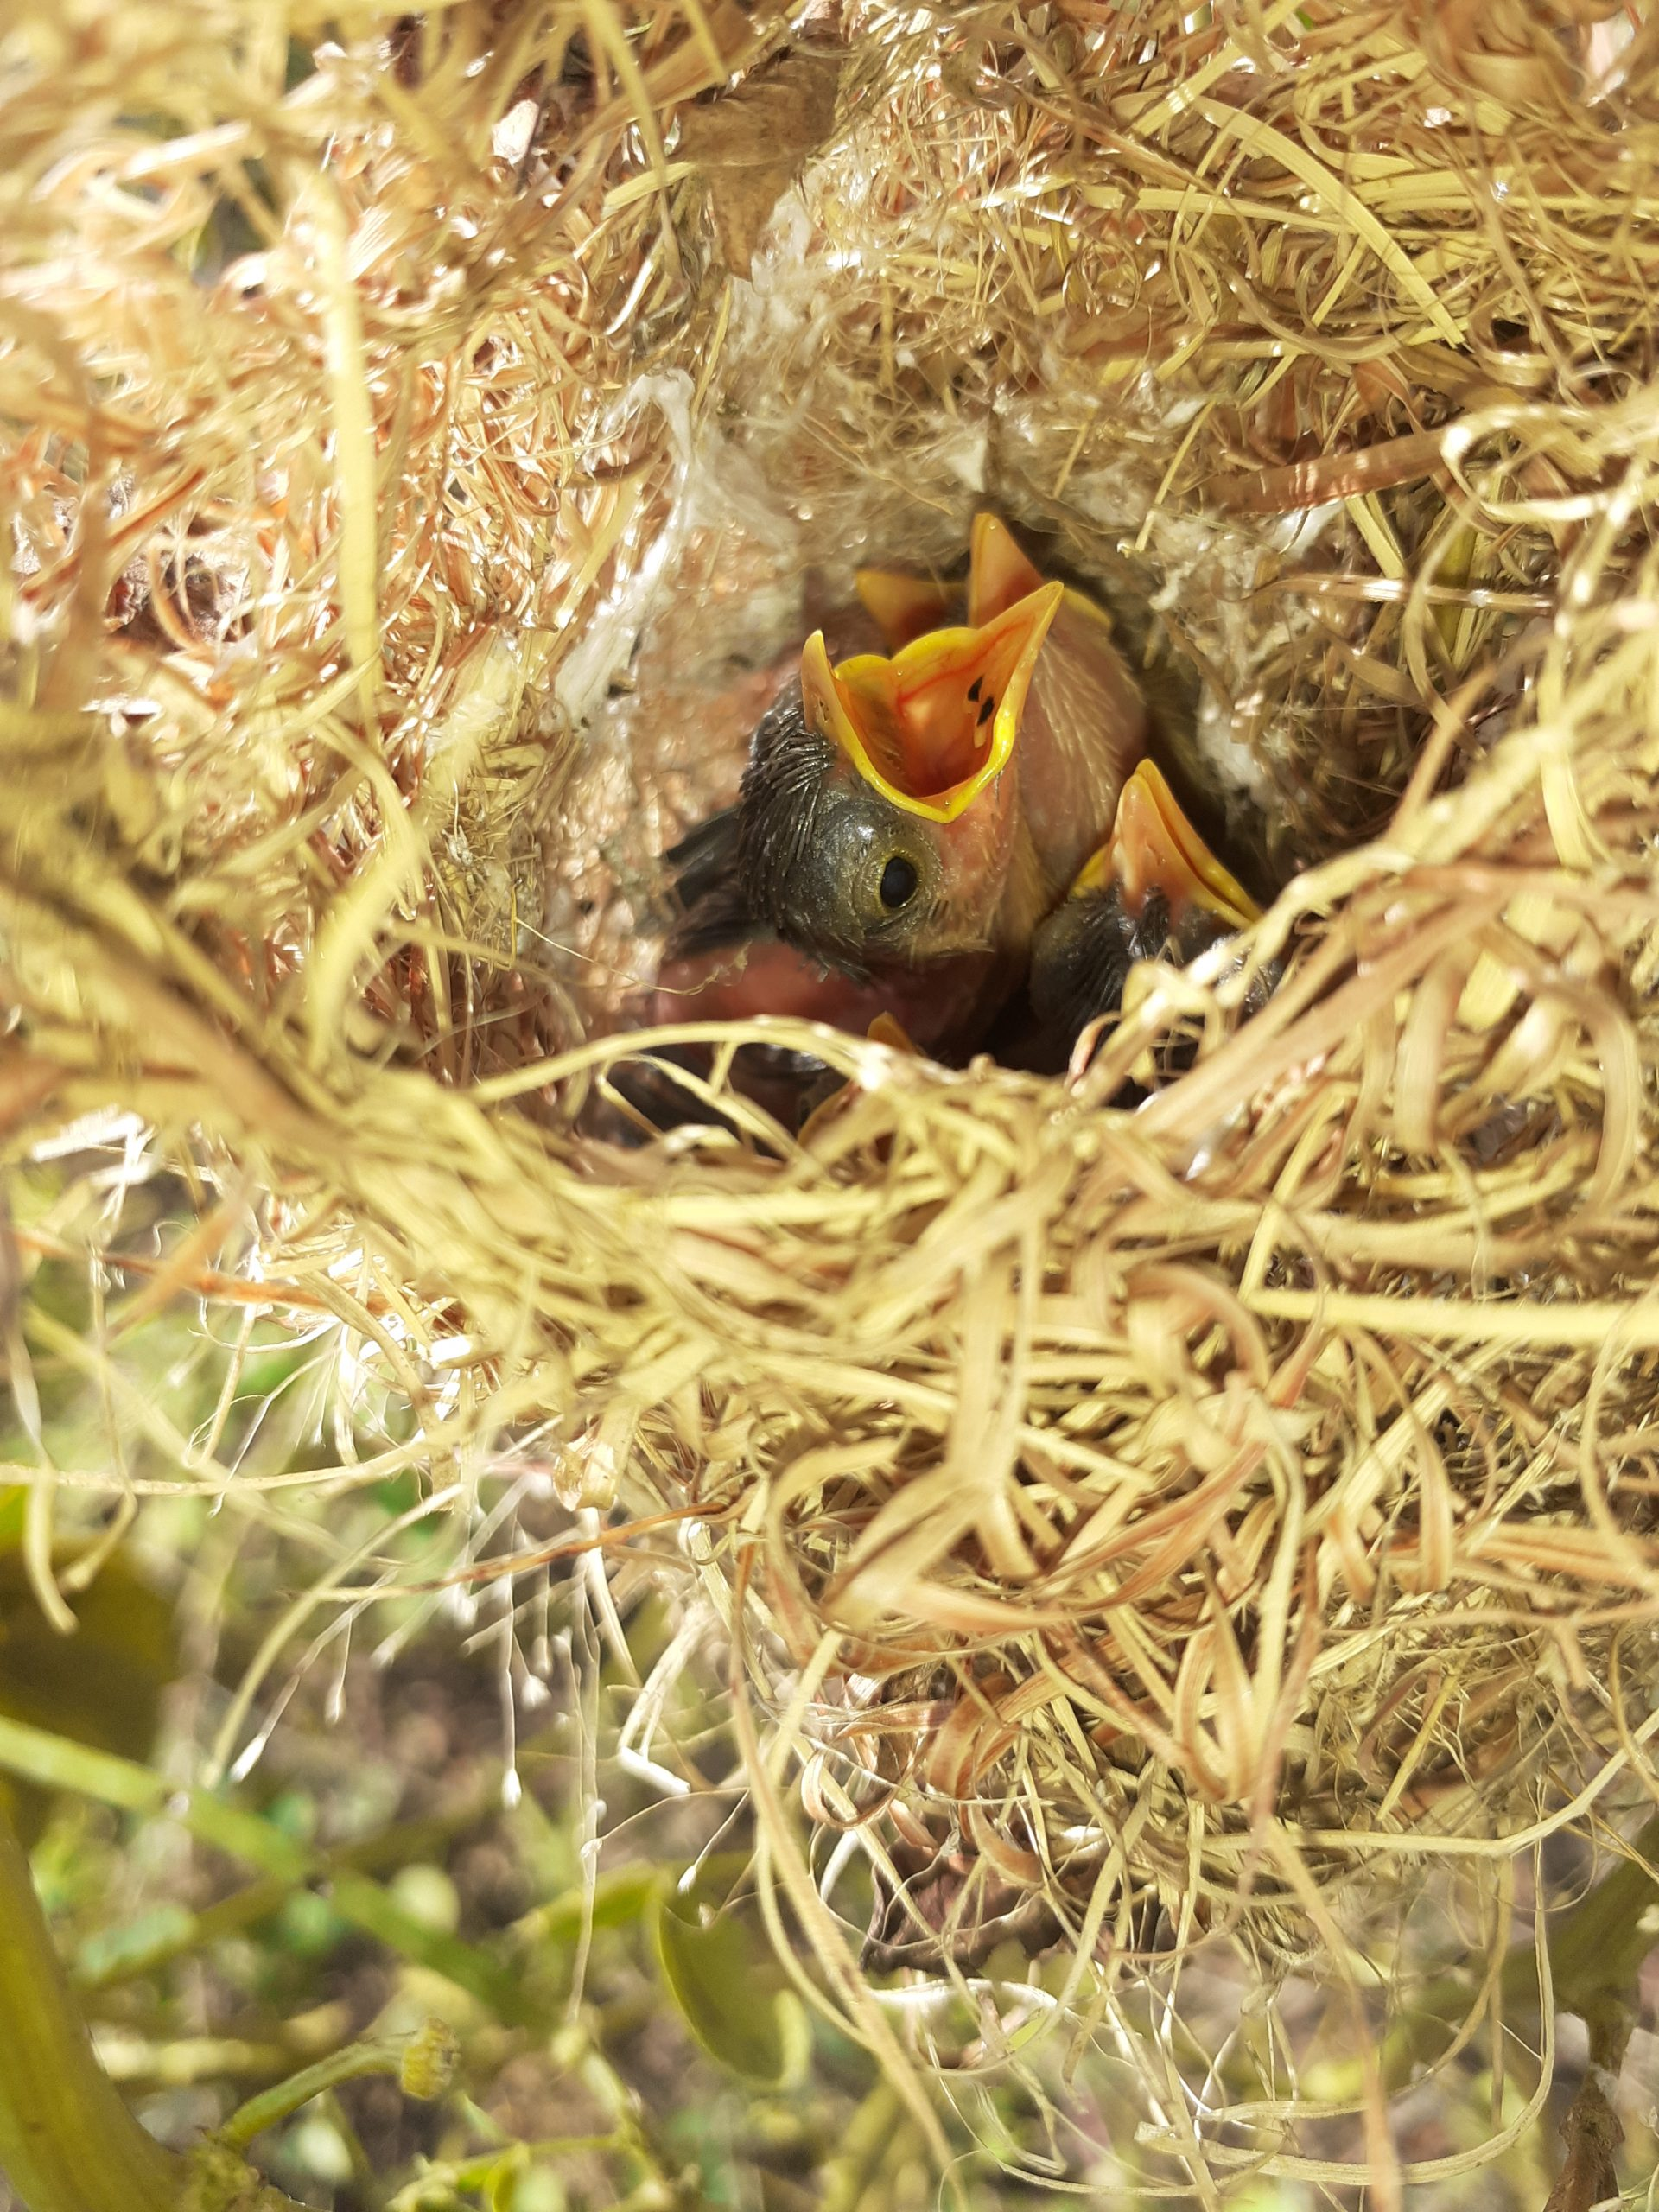 Little bird opening mouth